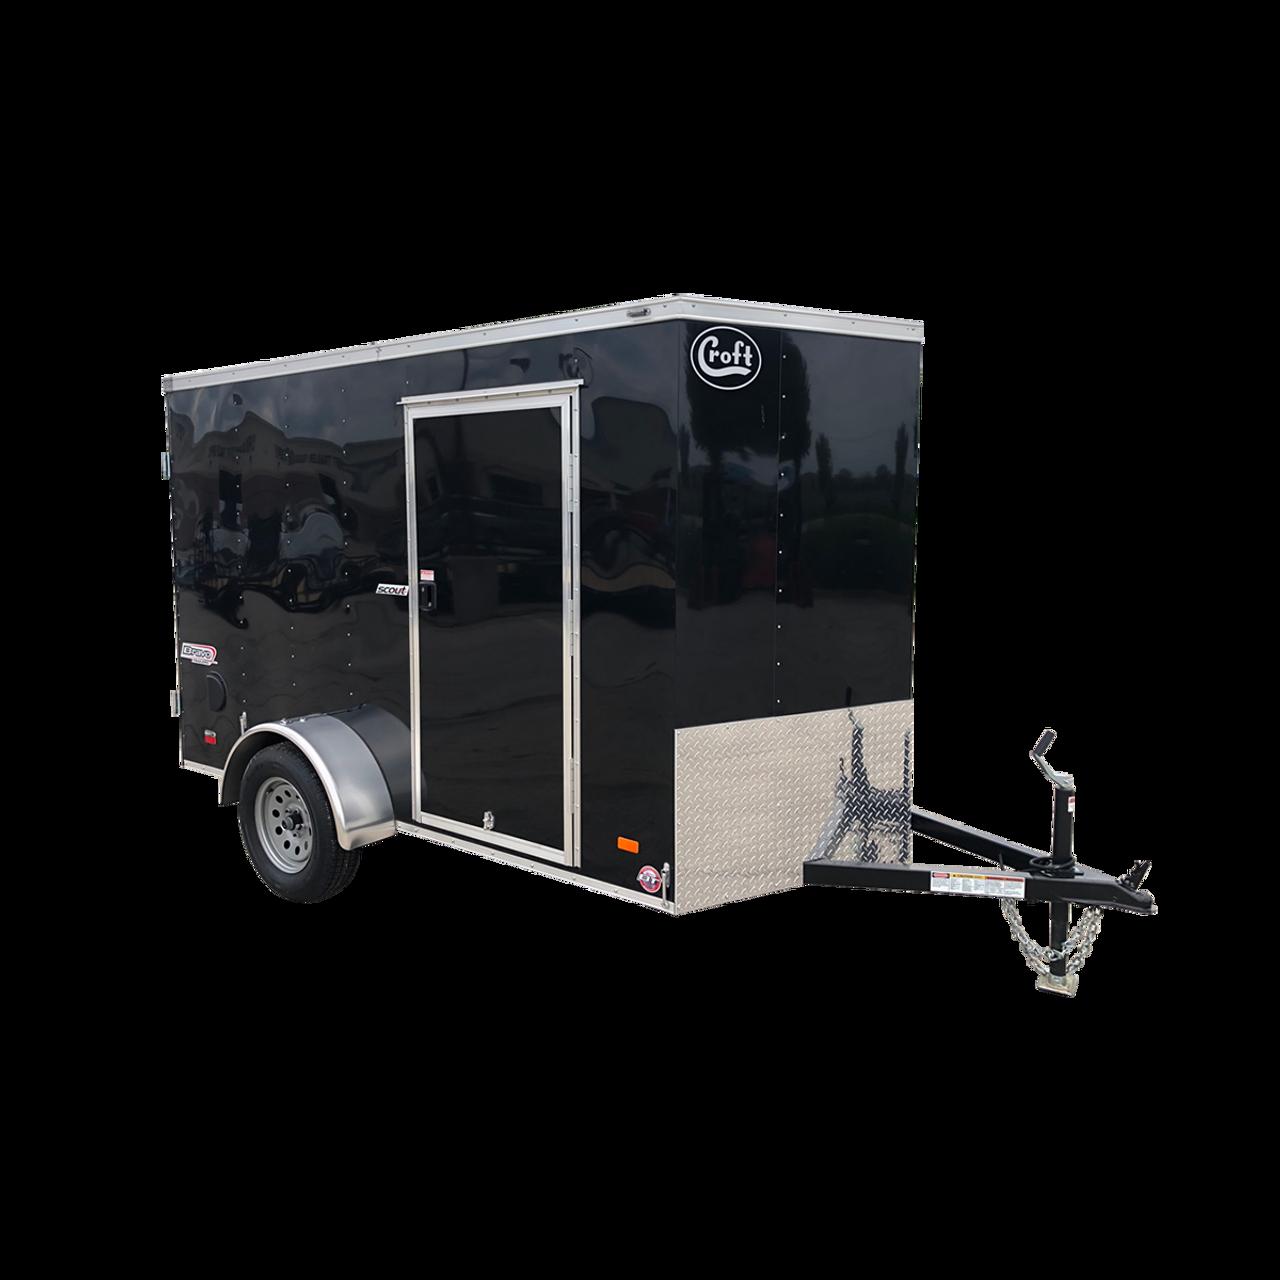 SC610SAD --- 6' X 10' Enclosed Trailer with Double Rear Doors - Bravo